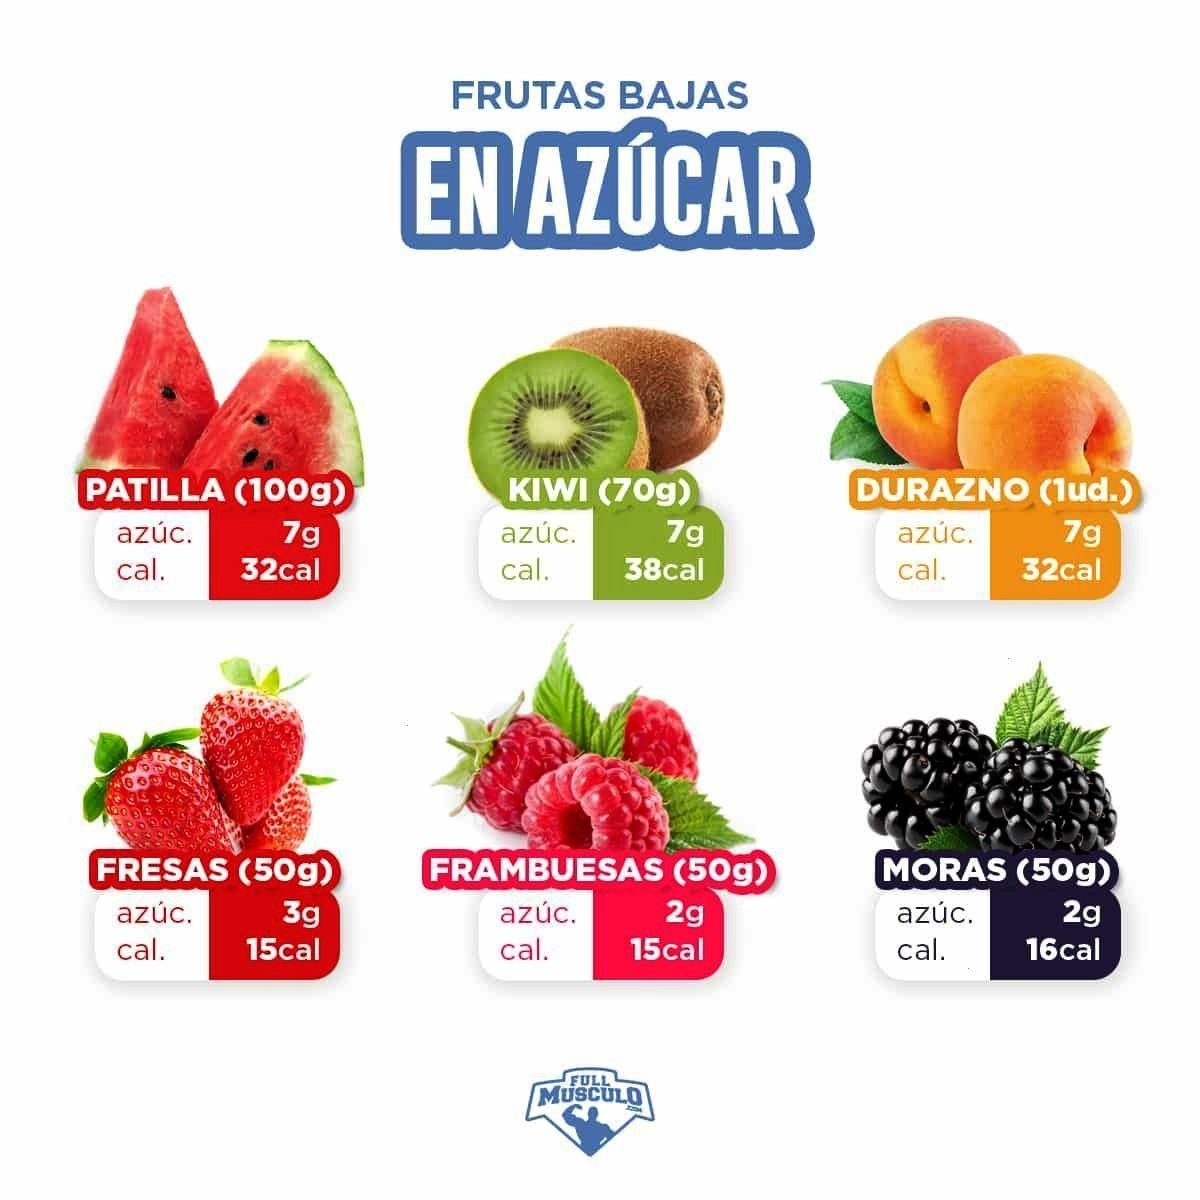 #dietasaludable #weightlifting #infografia #saludables #saludable